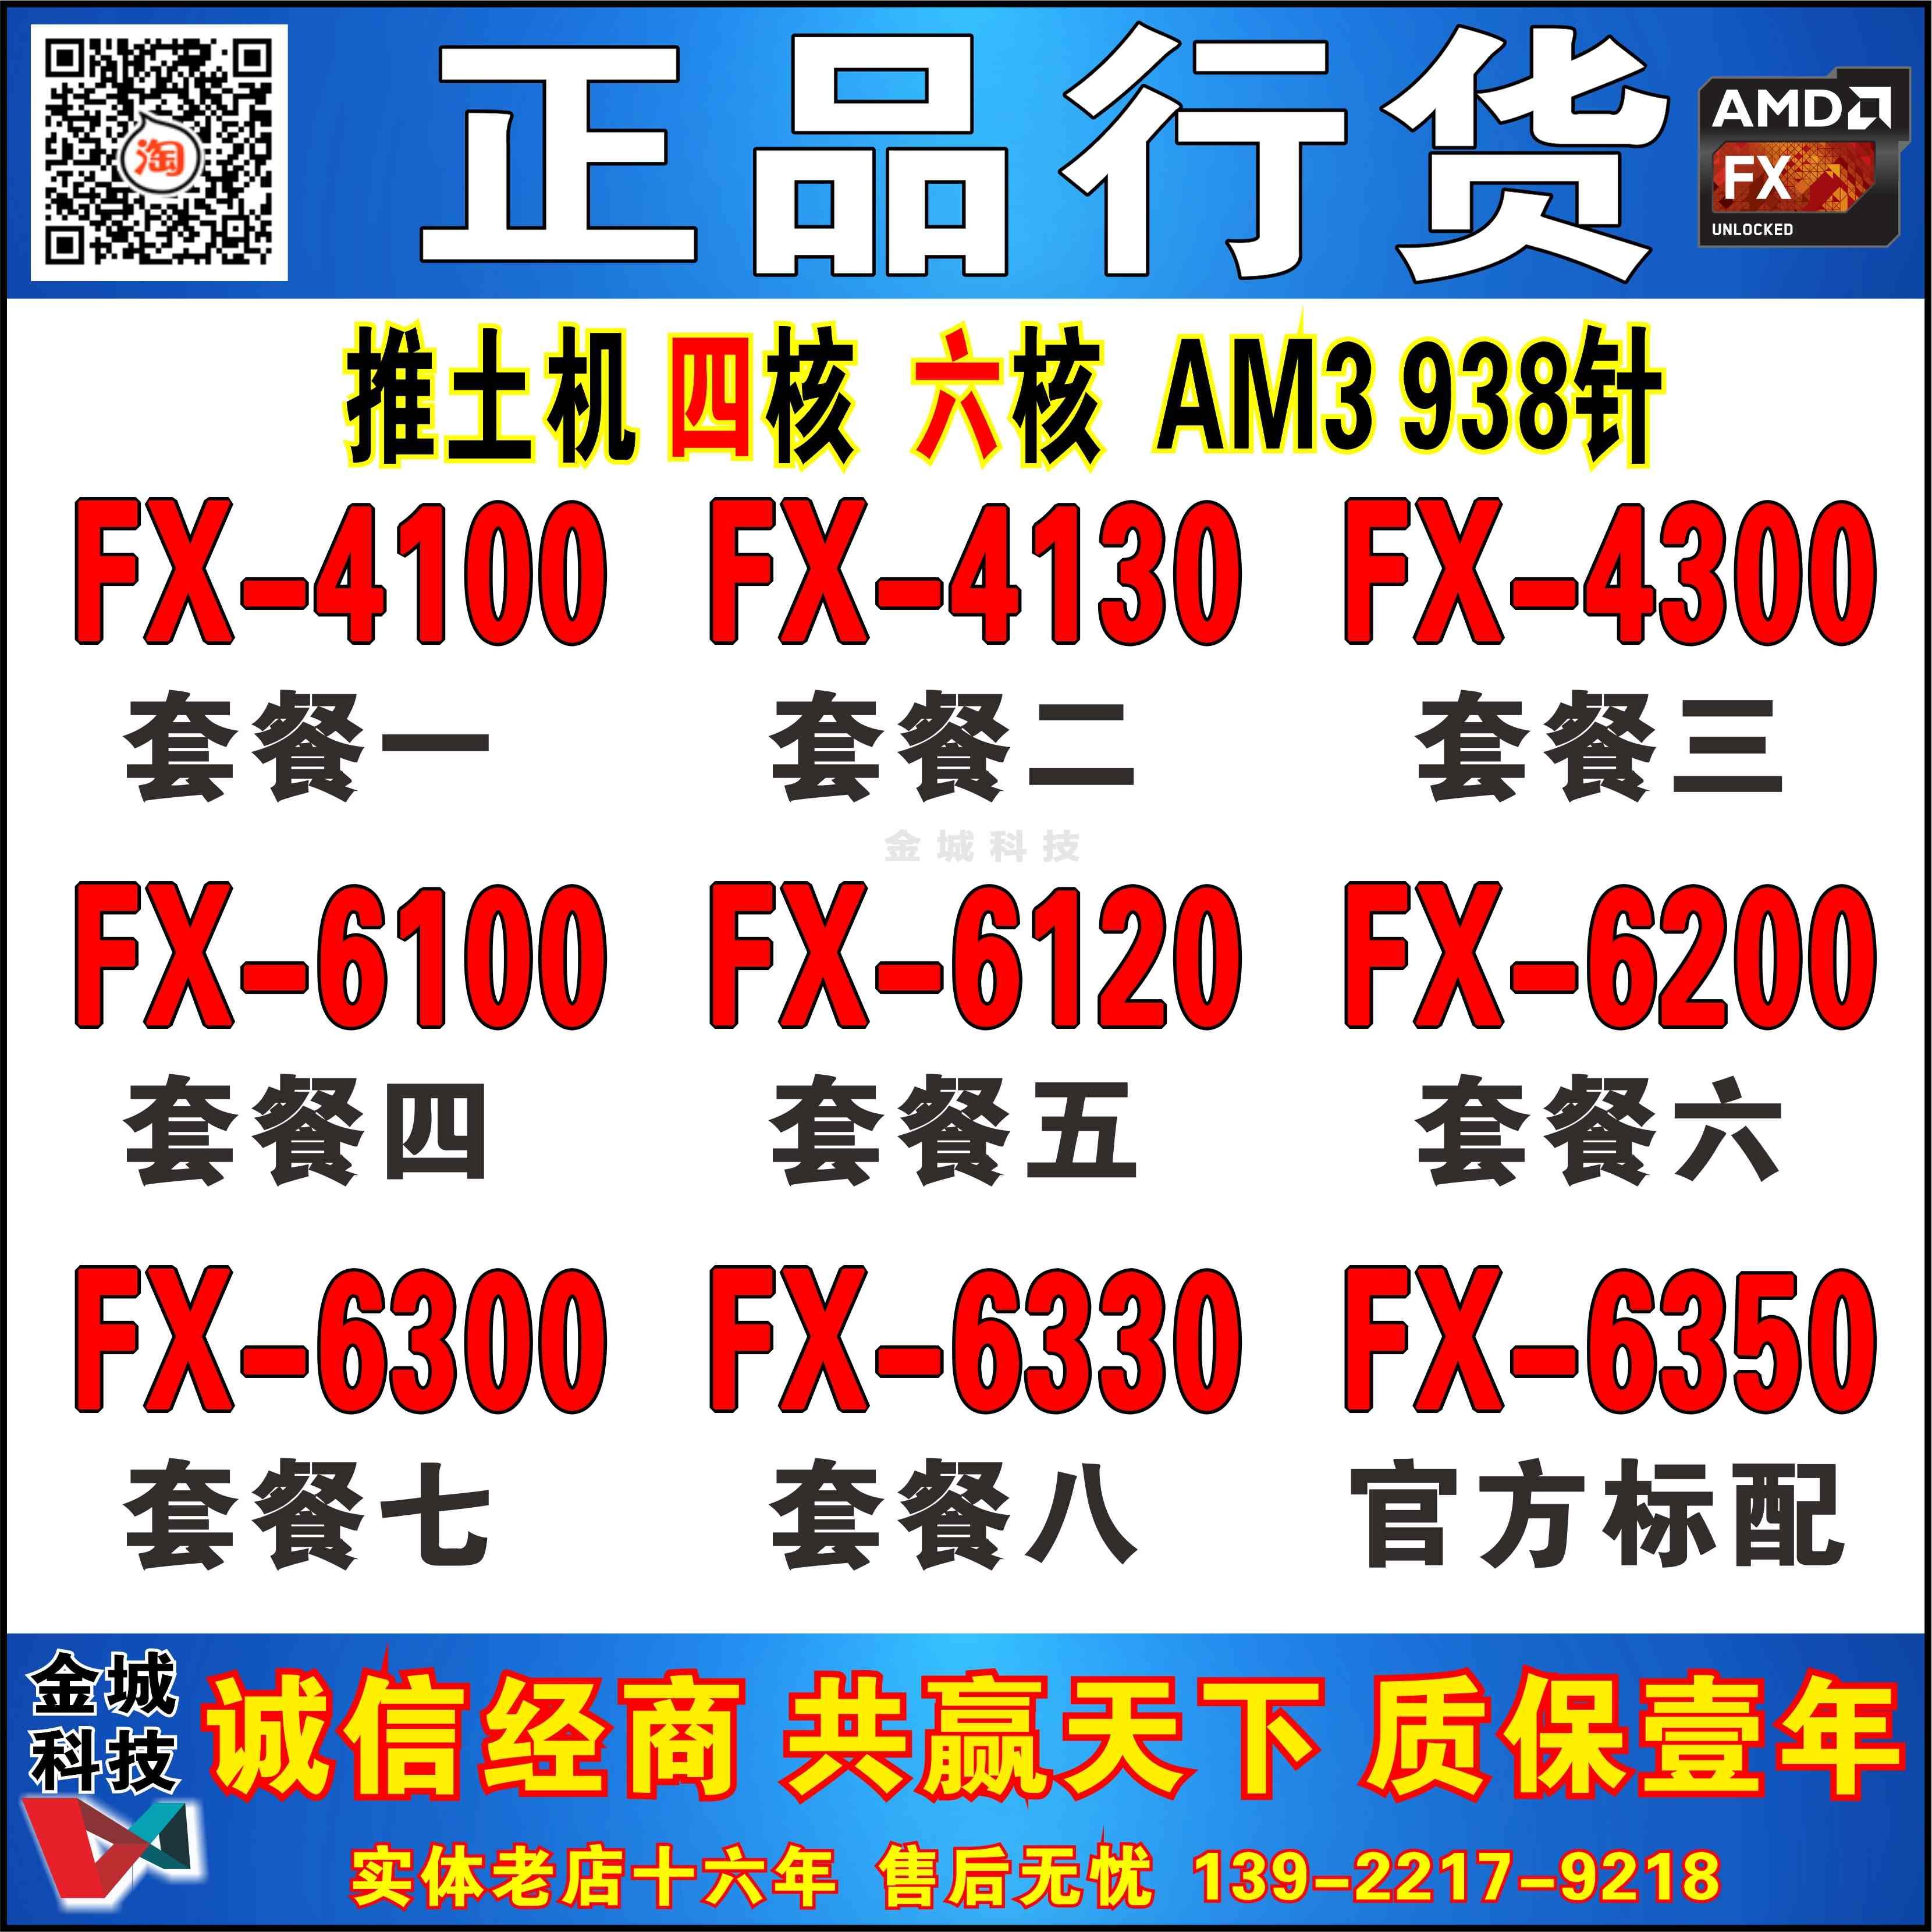 AMD FX 6100 6200 6300 6350 FX4100 4130 4300六核散片AM3+CPU